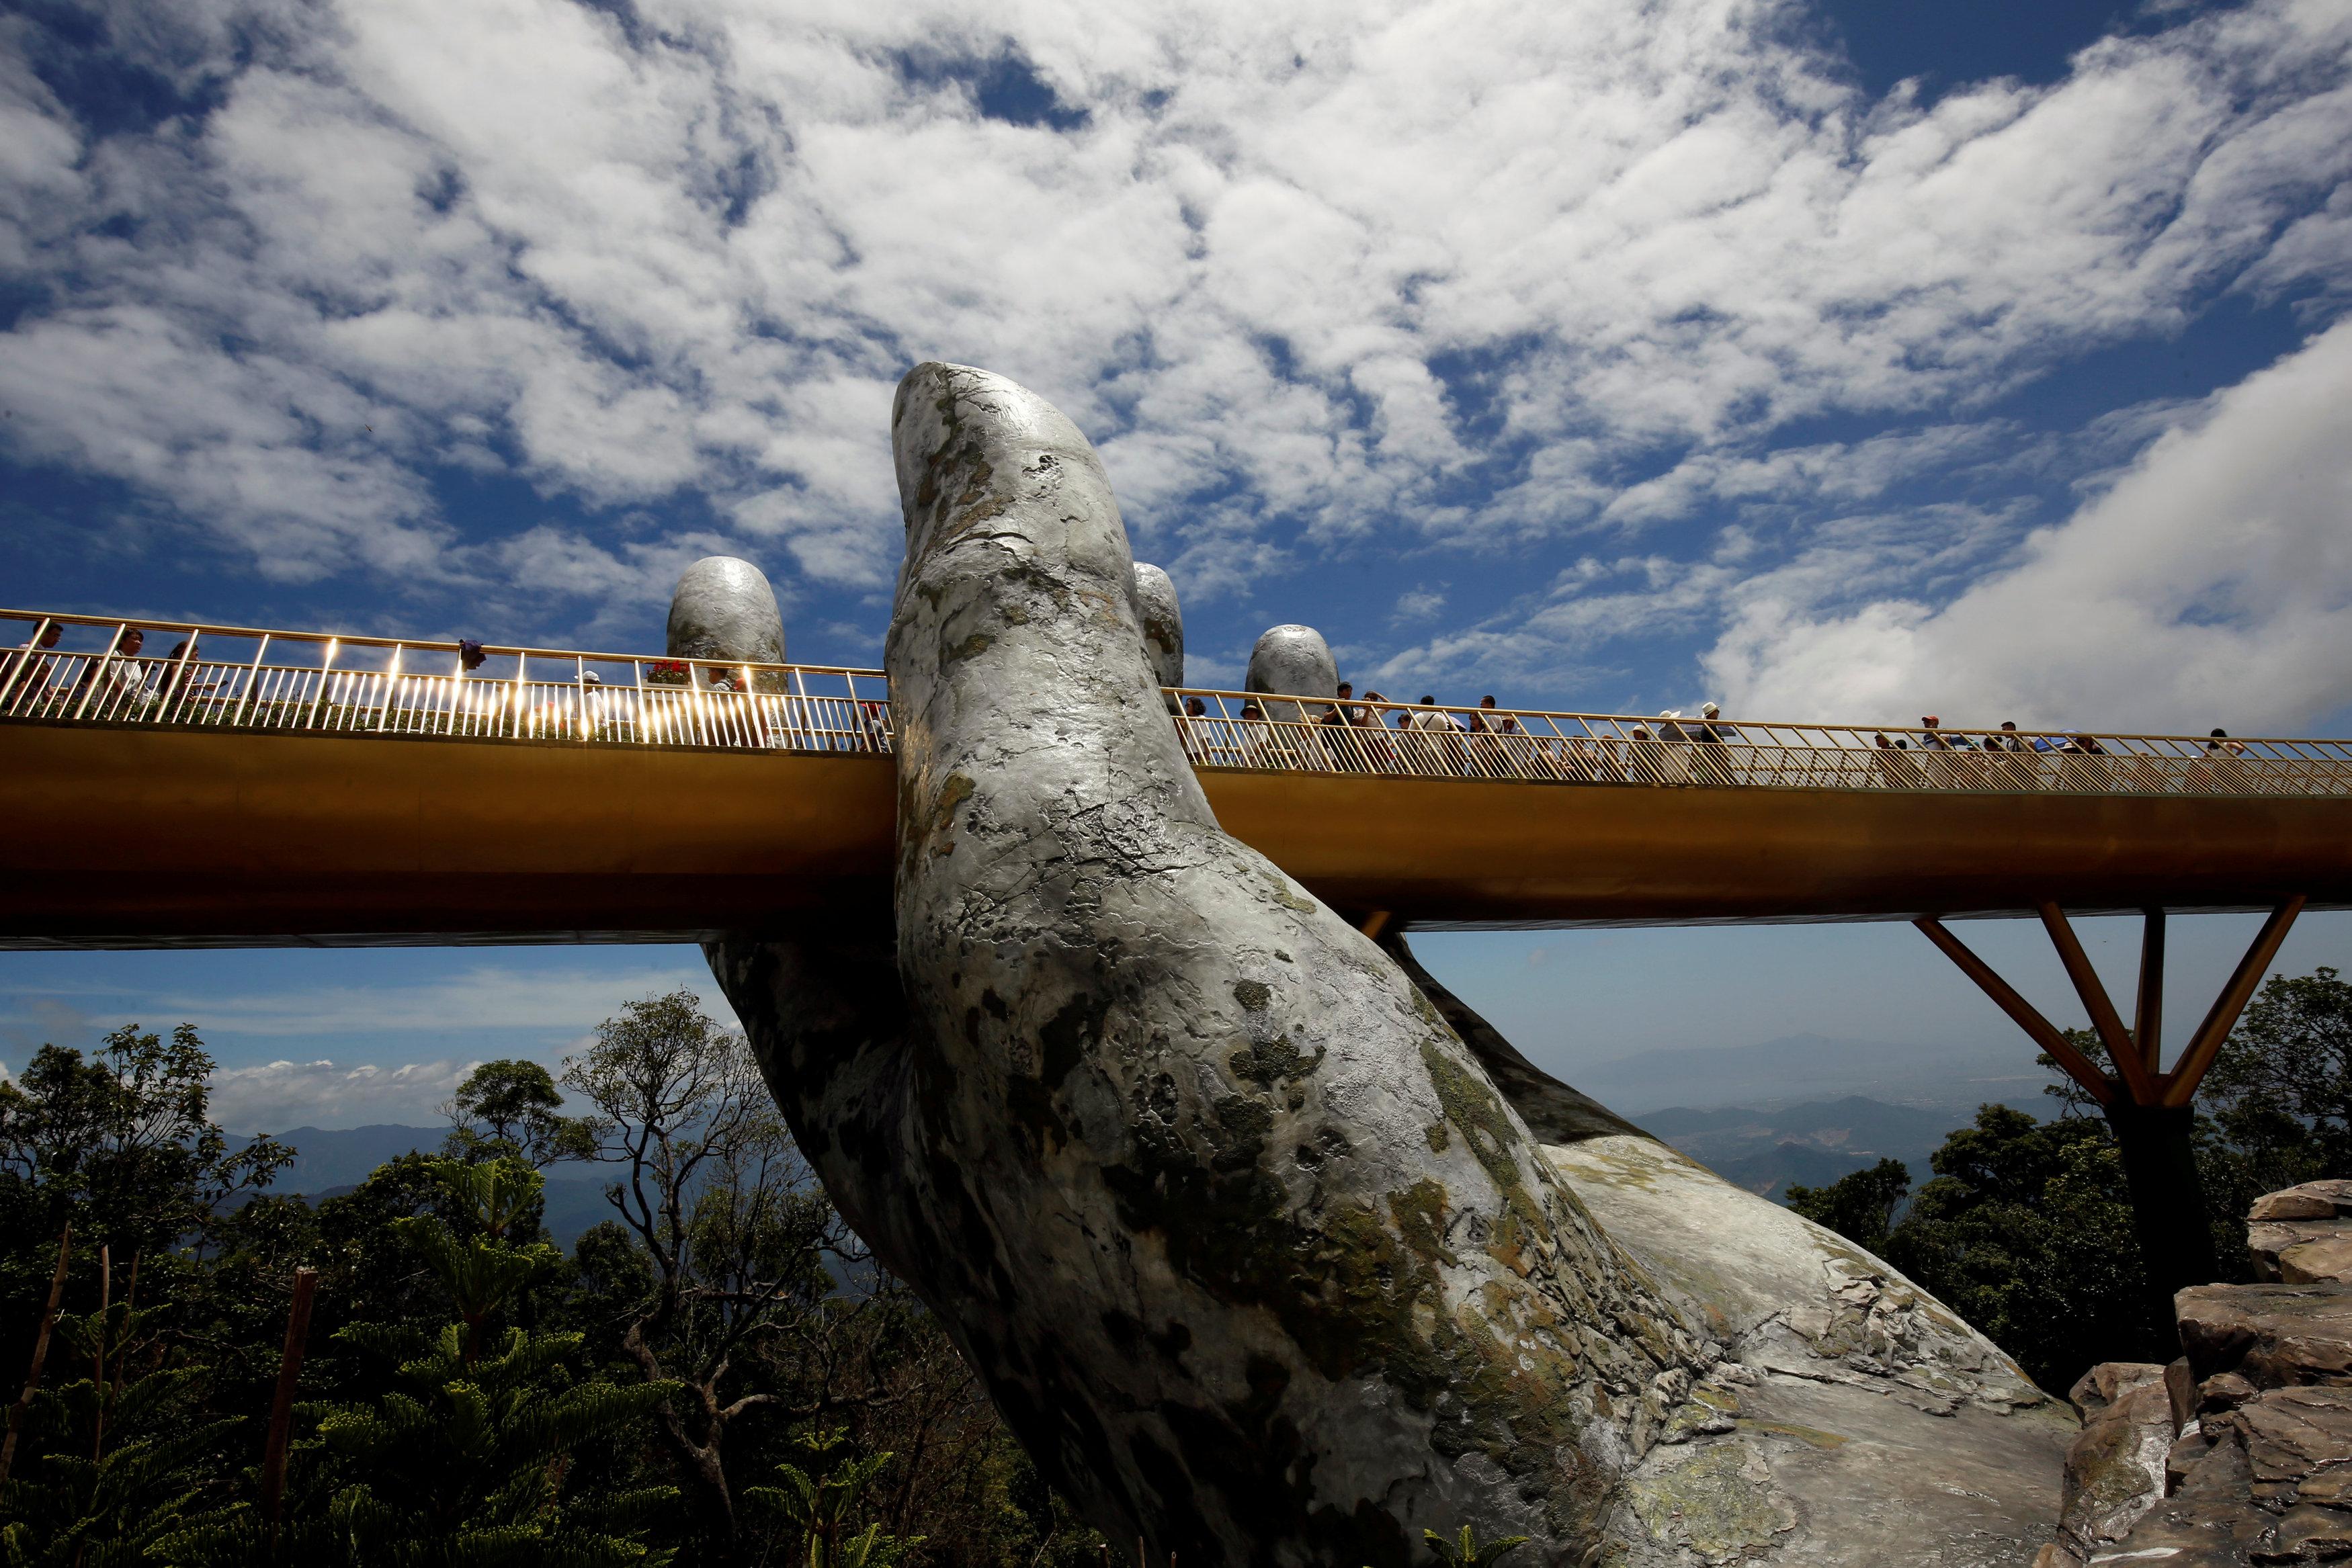 Dos manos parecen sostener la estructura delGold Bridgeen Vietnam. (Reuters/Kham)